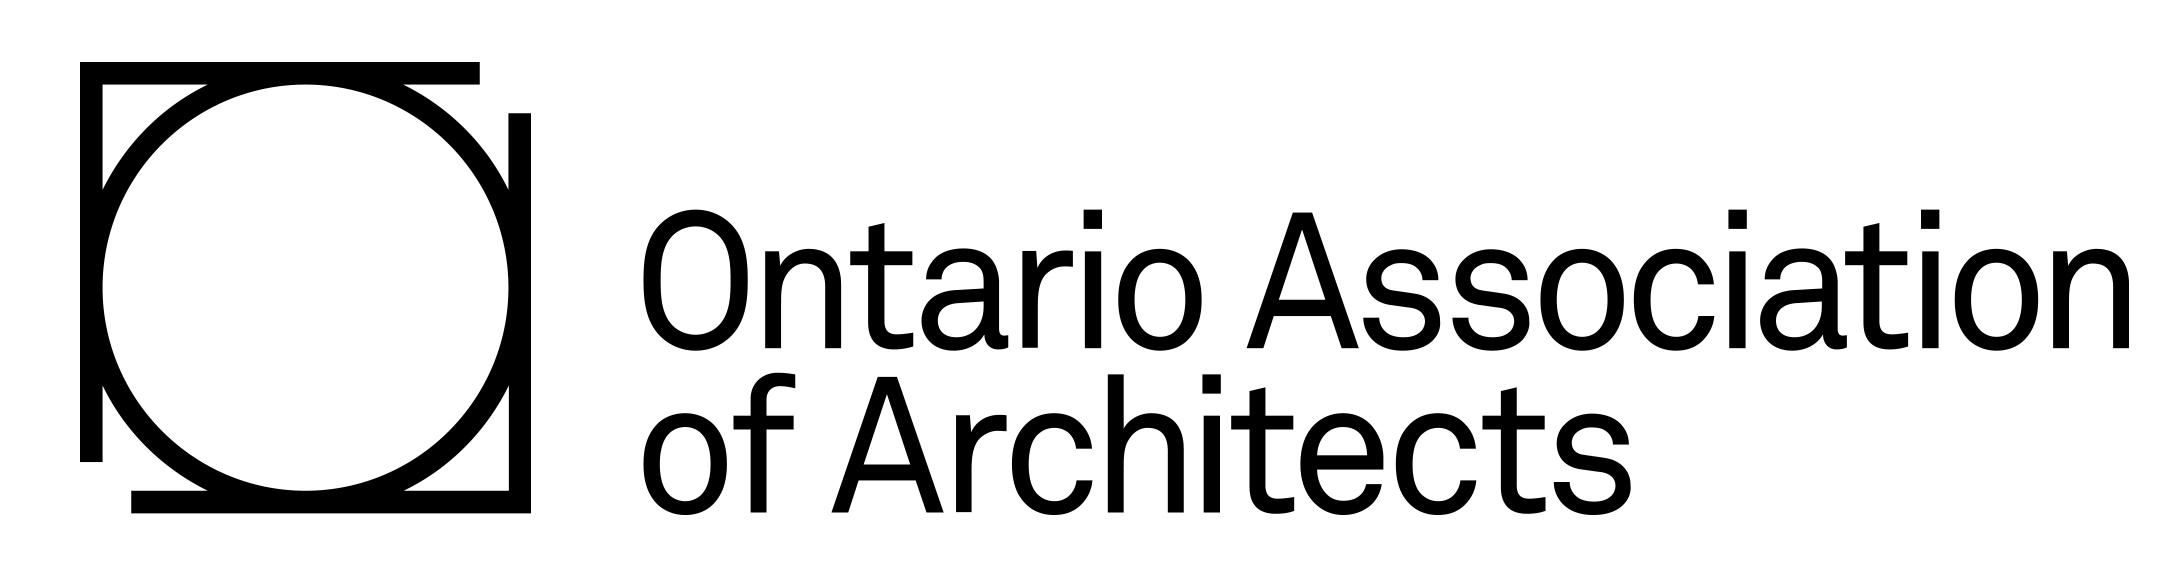 Ontario Association of Architects